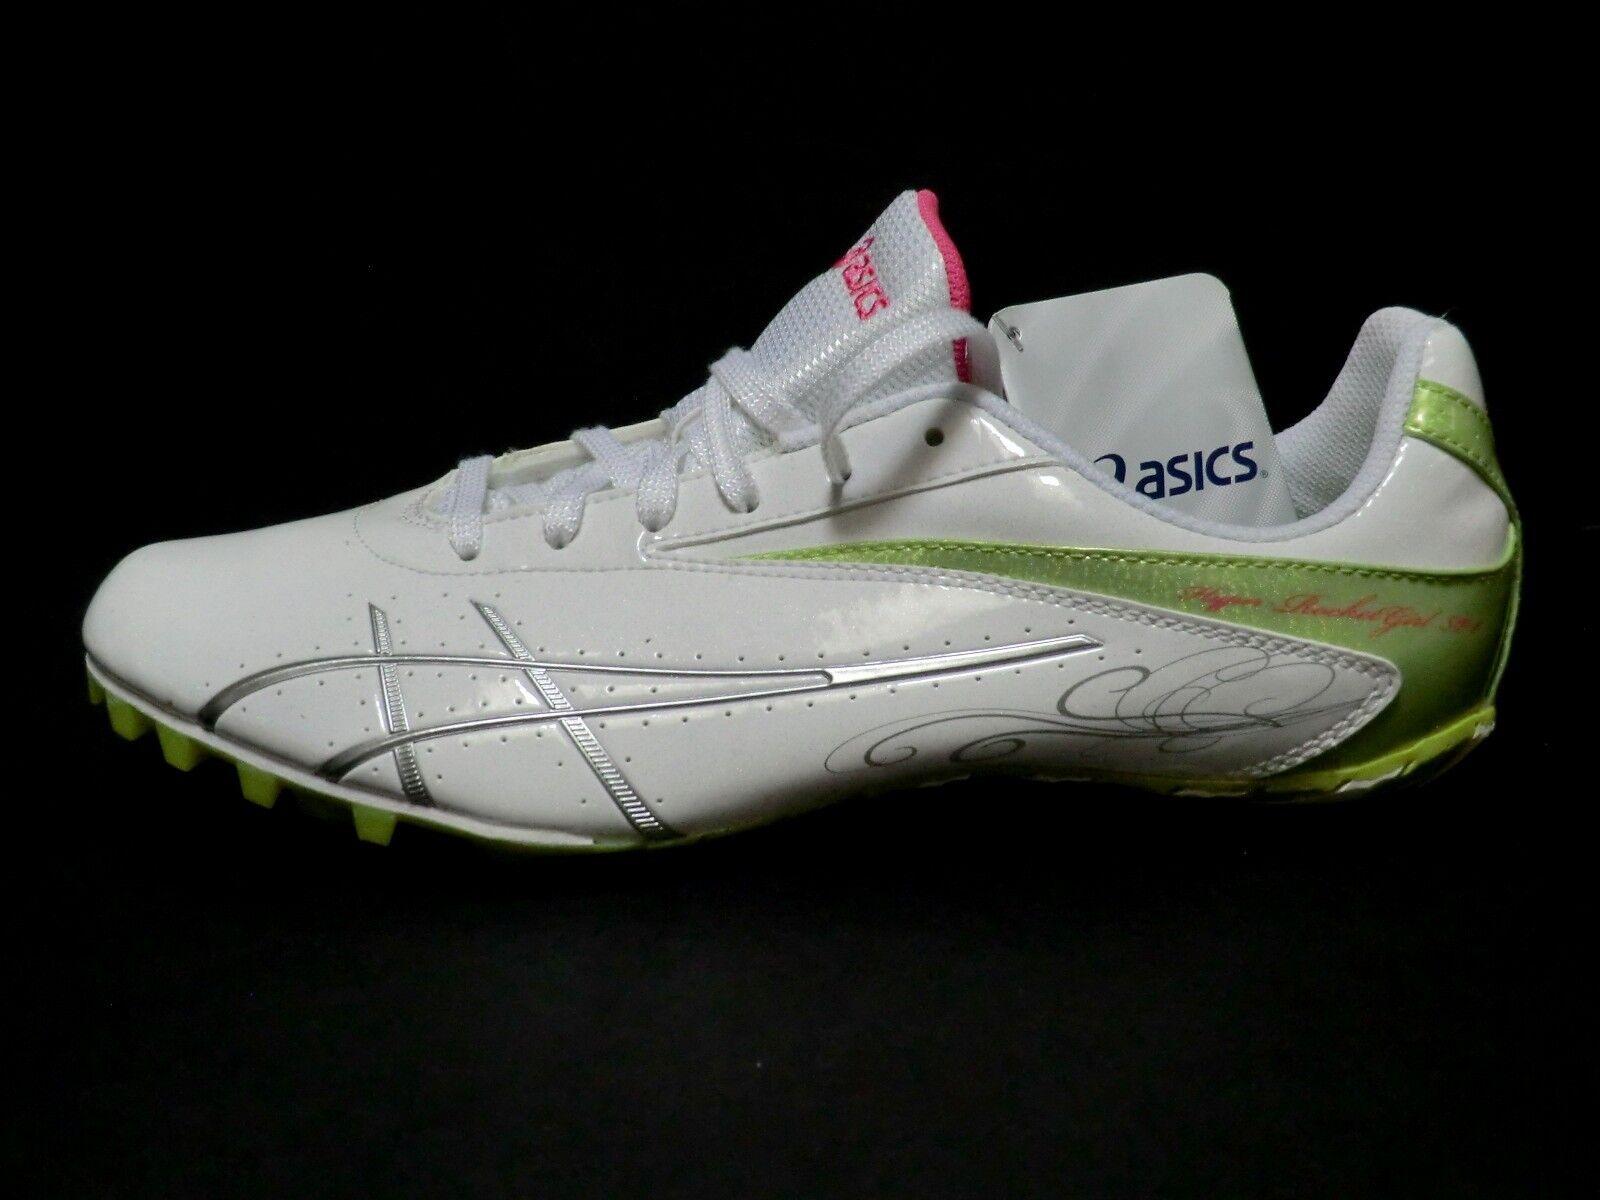 Asics womens 10 Spike sneakers shoes hyper rocketgirl SP4 sprinters new G153Y